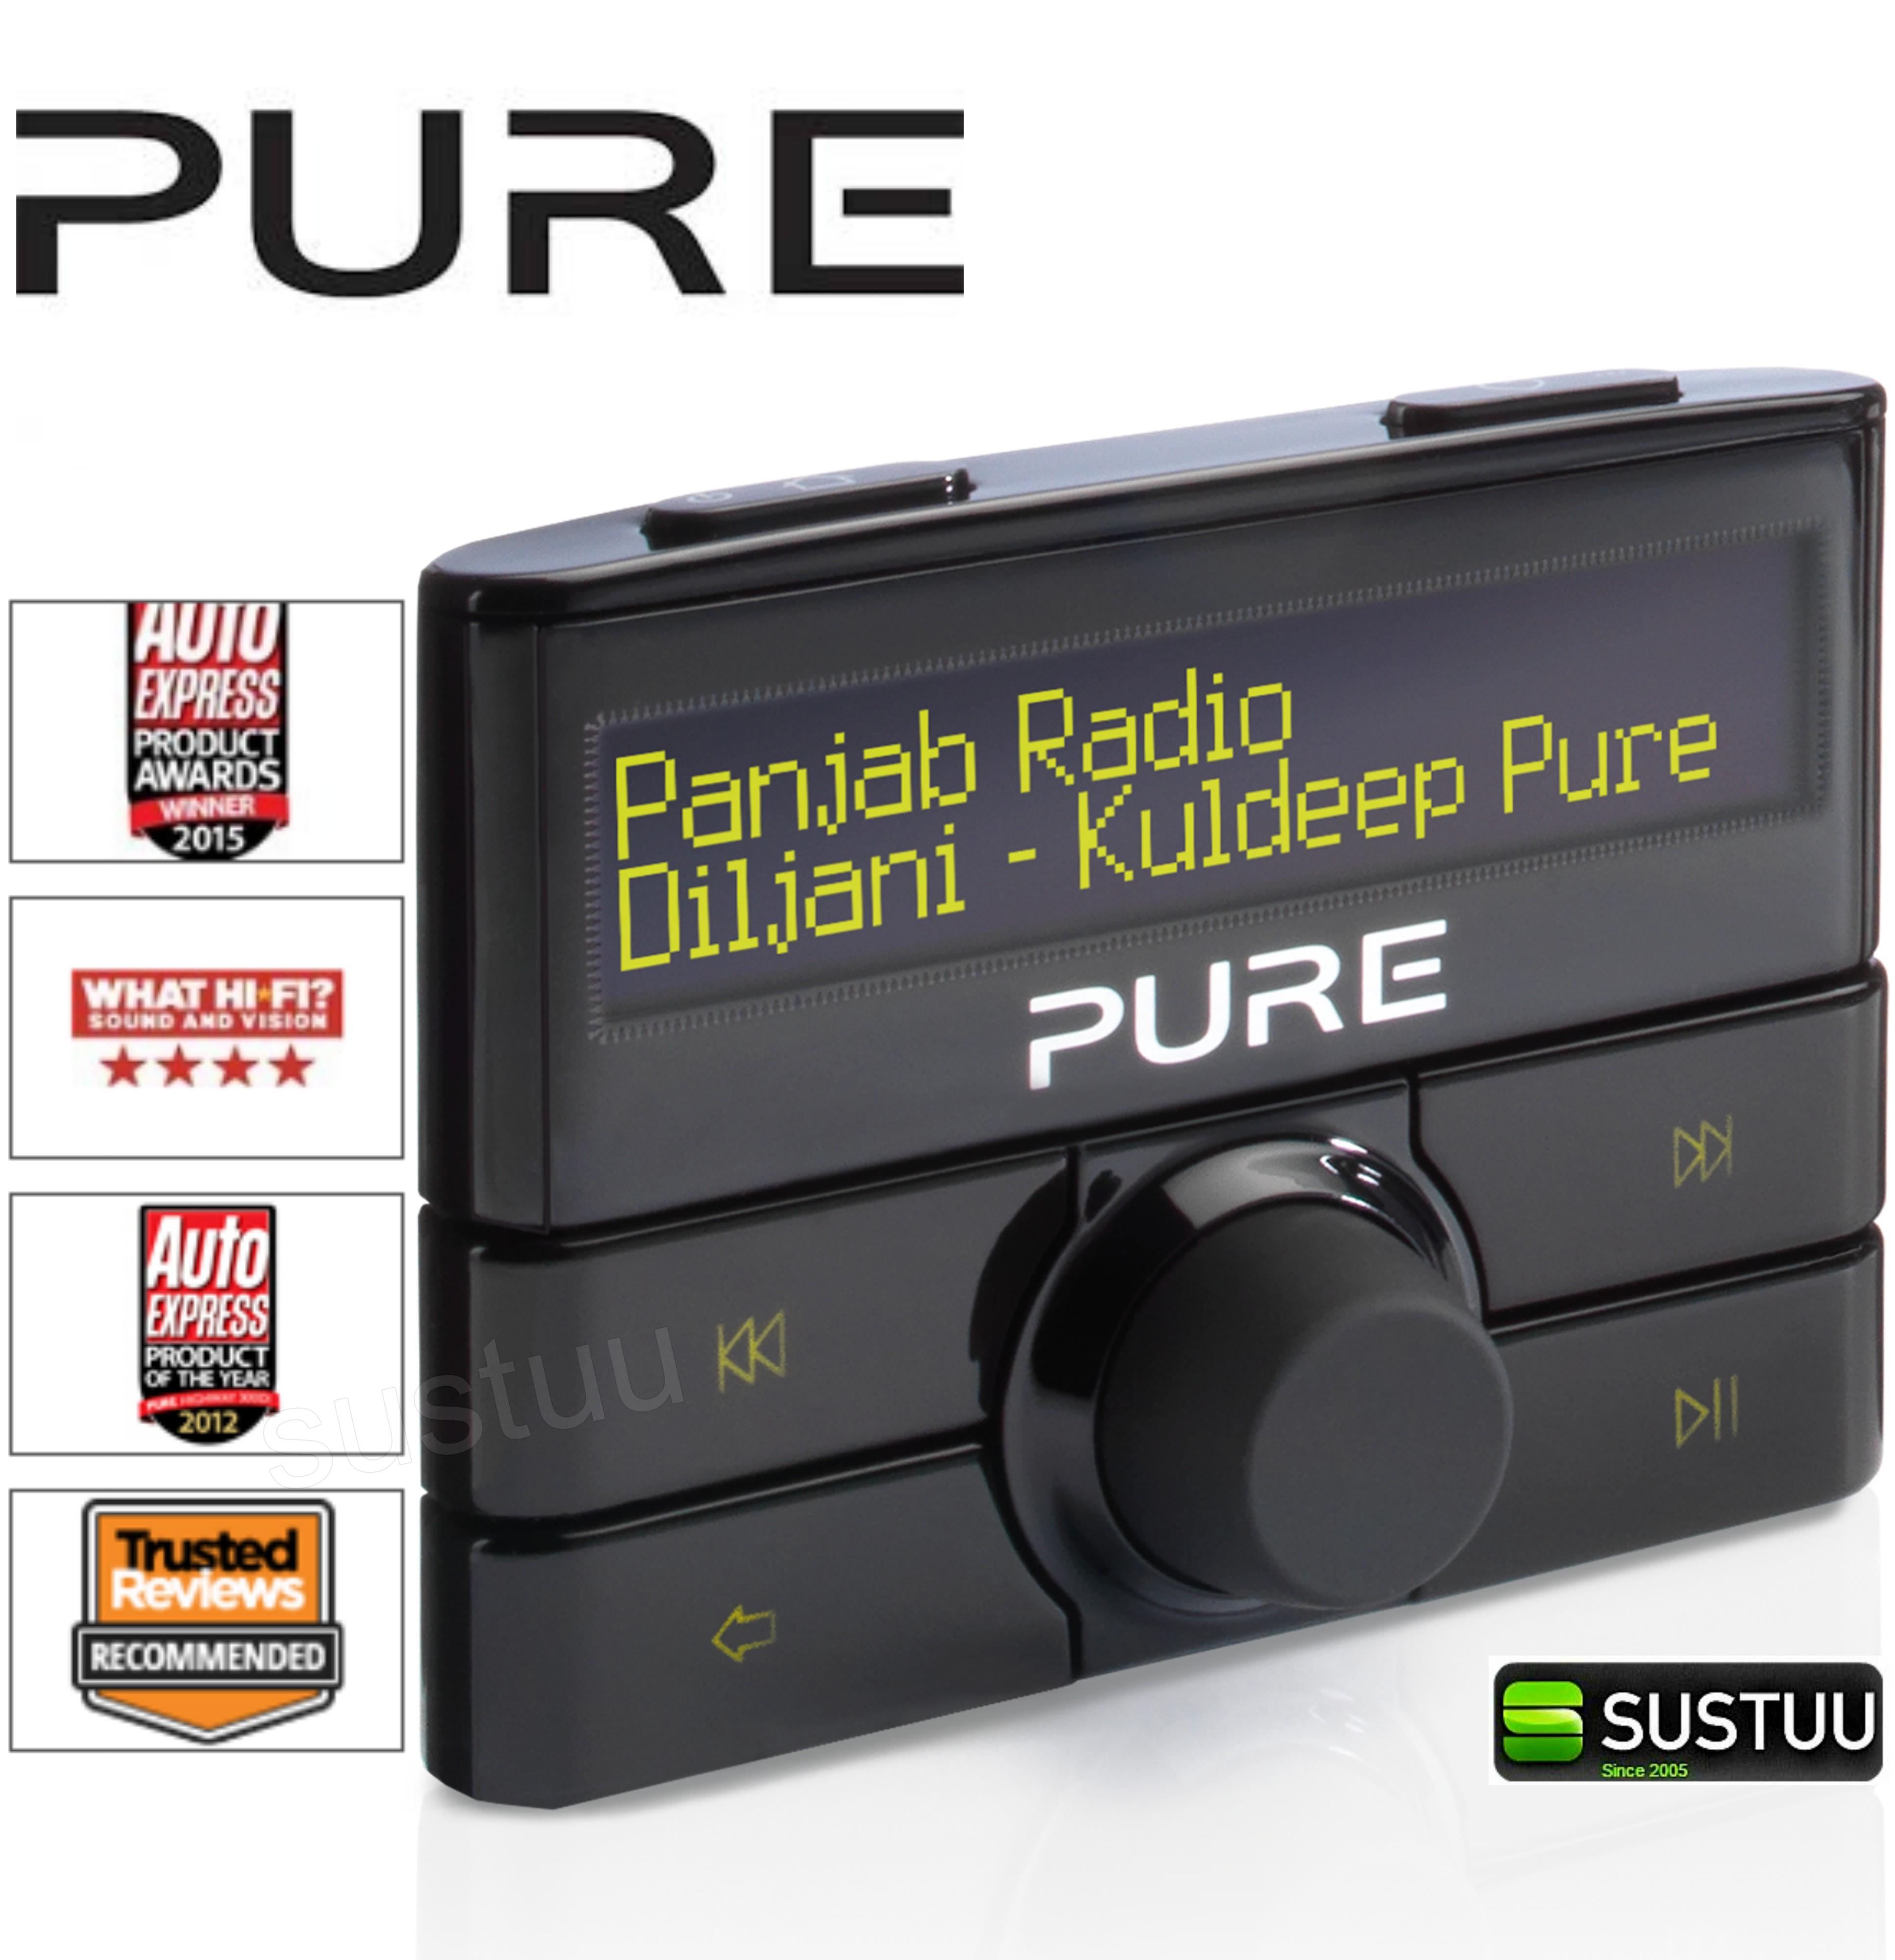 Pure Highway 300DI Add on DAB In Car Digital Radio | Aux | USB | Fits iPod-iPhone-iPad